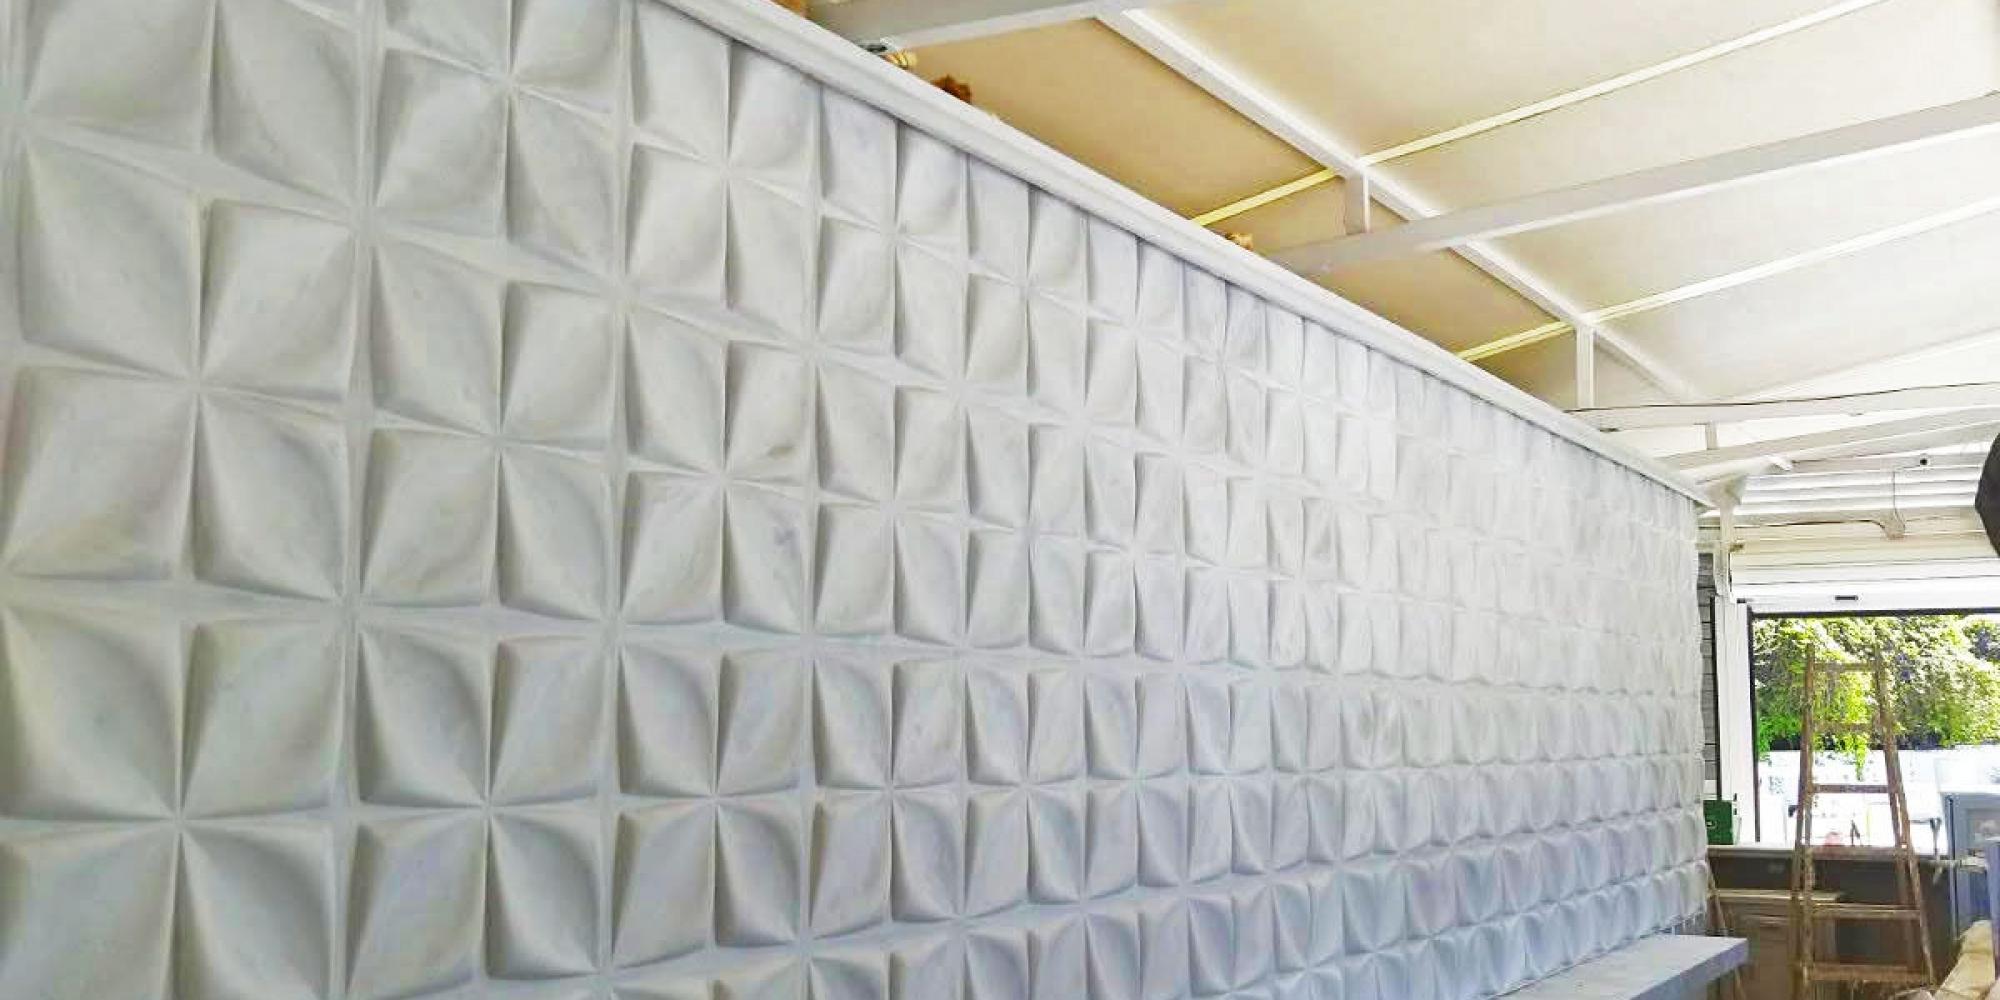 3D Panels Γύψινες Διακοσμήσεις